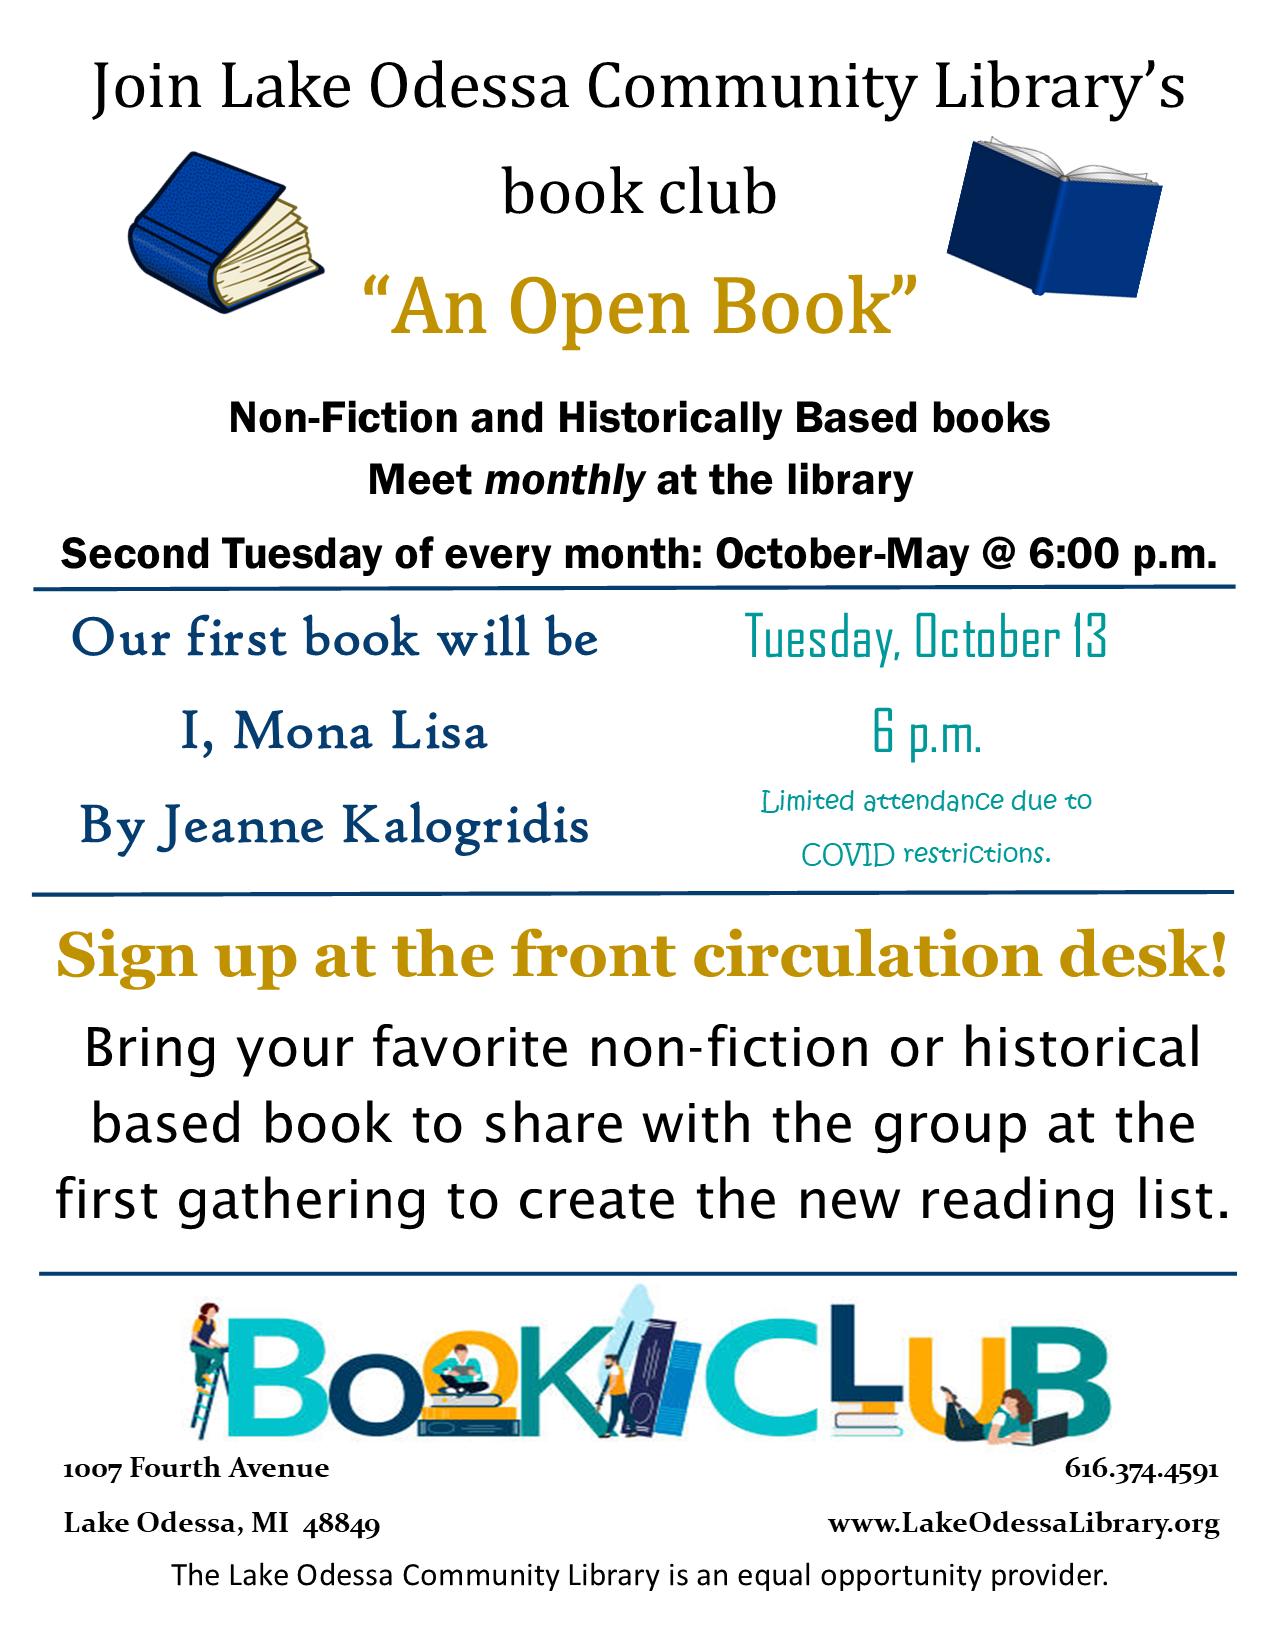 OpenBookClub2020A.png